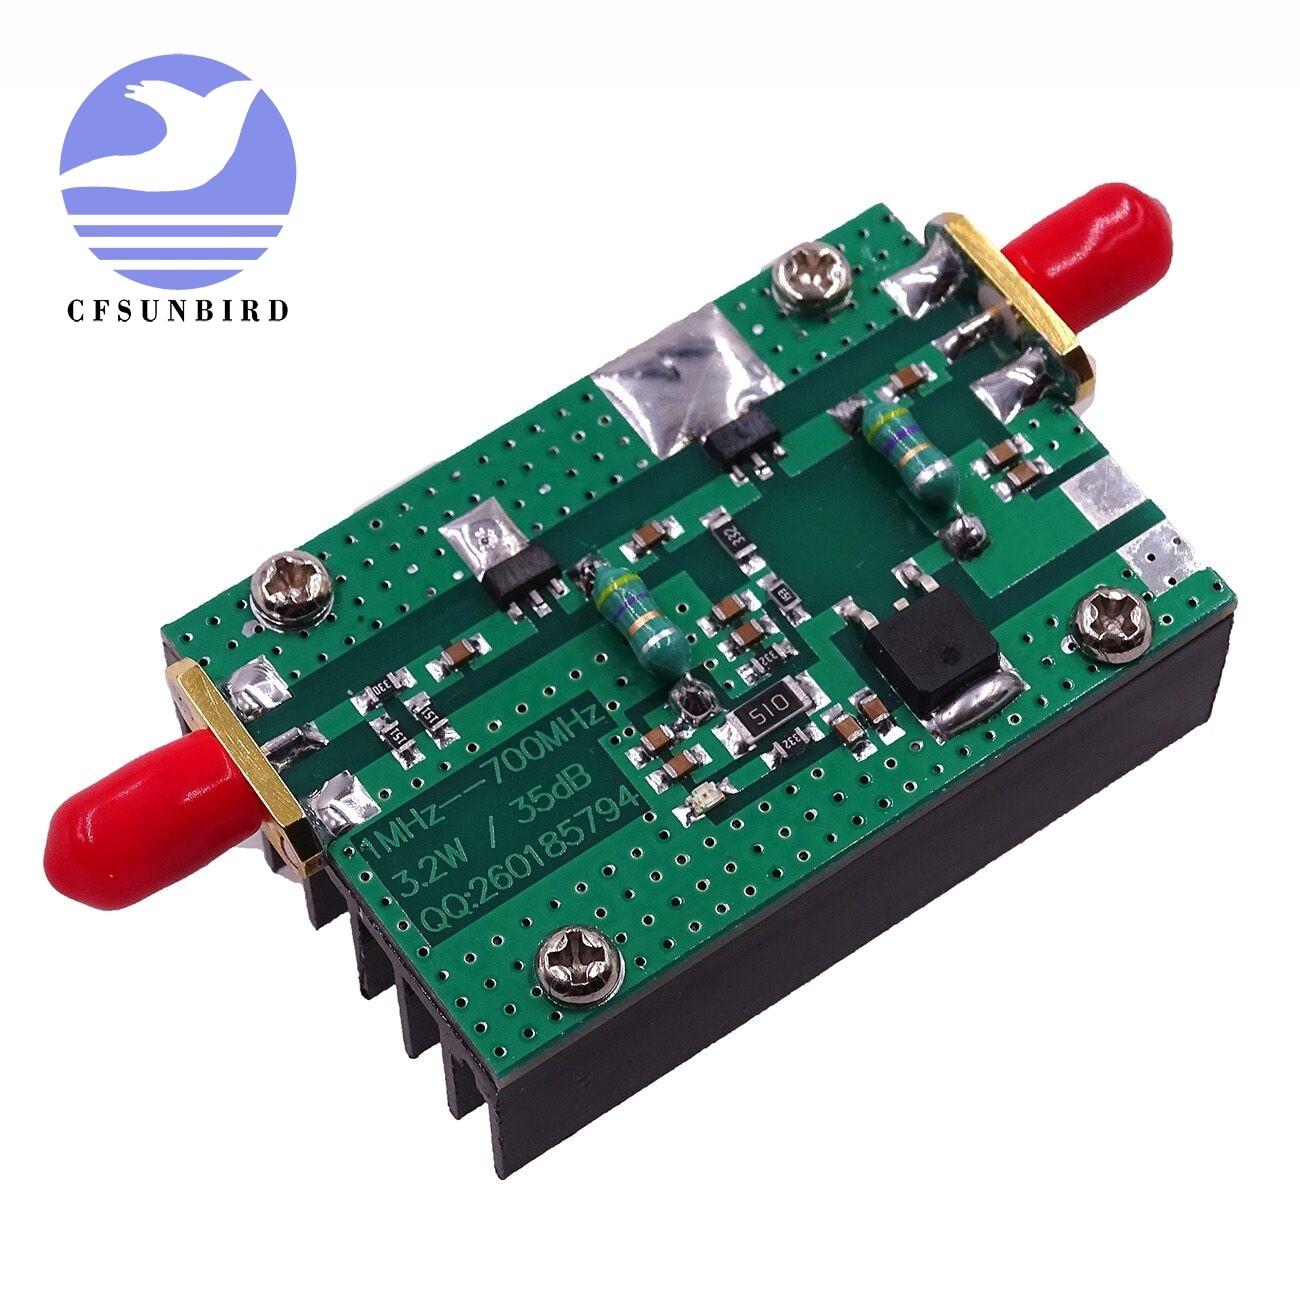 1mhz 500 Mhz 15 W Amplifier Hf Fm Vhf Uhf Rf Power In 5 Watt Tv Cfsunbird 1pcs New Arrival 700mhz 32w Transmitter